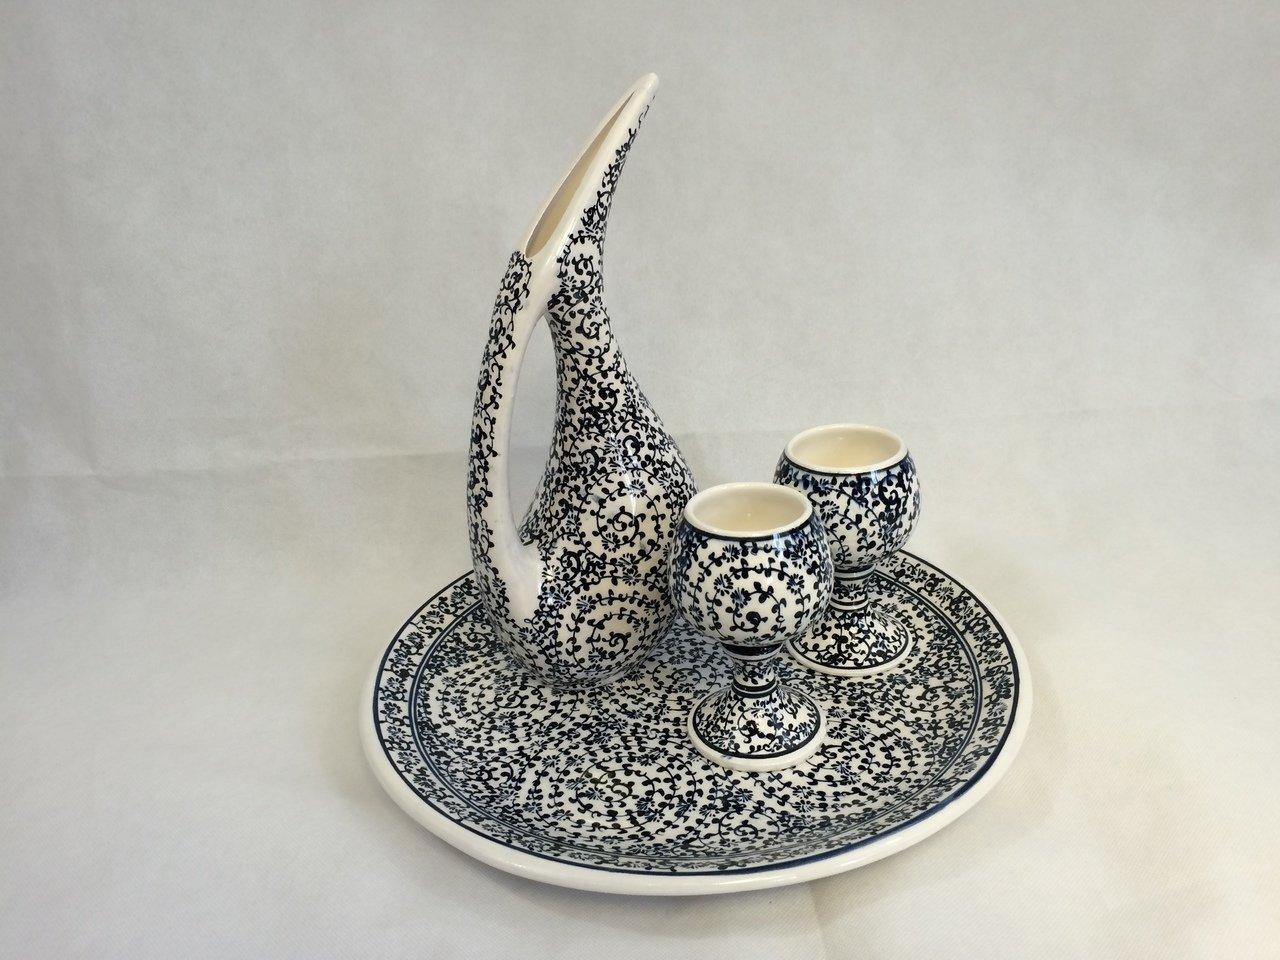 Handmade Ceramic Pelican Coffee/Tea/Wine Jug/Decanter Set: Pelican Jug 11.5''/29 cm; Plate 13''/33 cm; 2 cups (Grey)